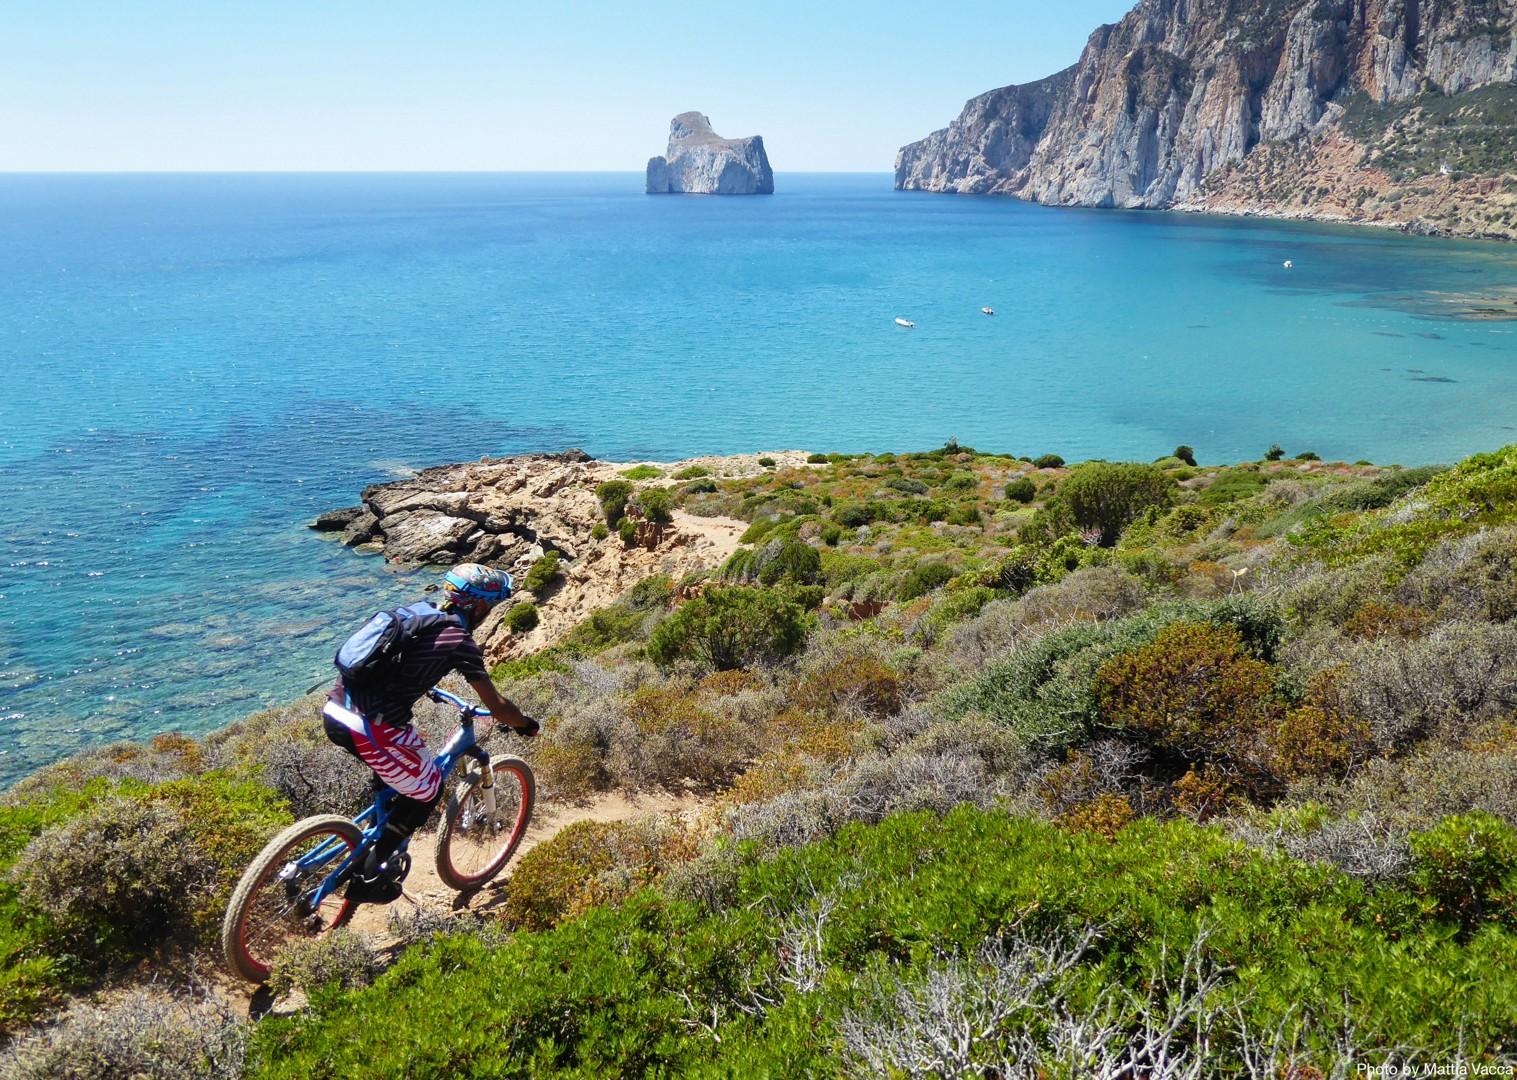 NebidaMasua05.jpg - Sardinia - Sardinian Enduro - Guided Mountain Bike Holiday - Italia Mountain Biking